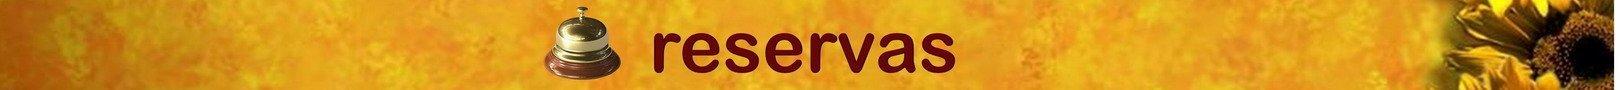 cabecera-seccion-reservas-con-texto-español-1620x90